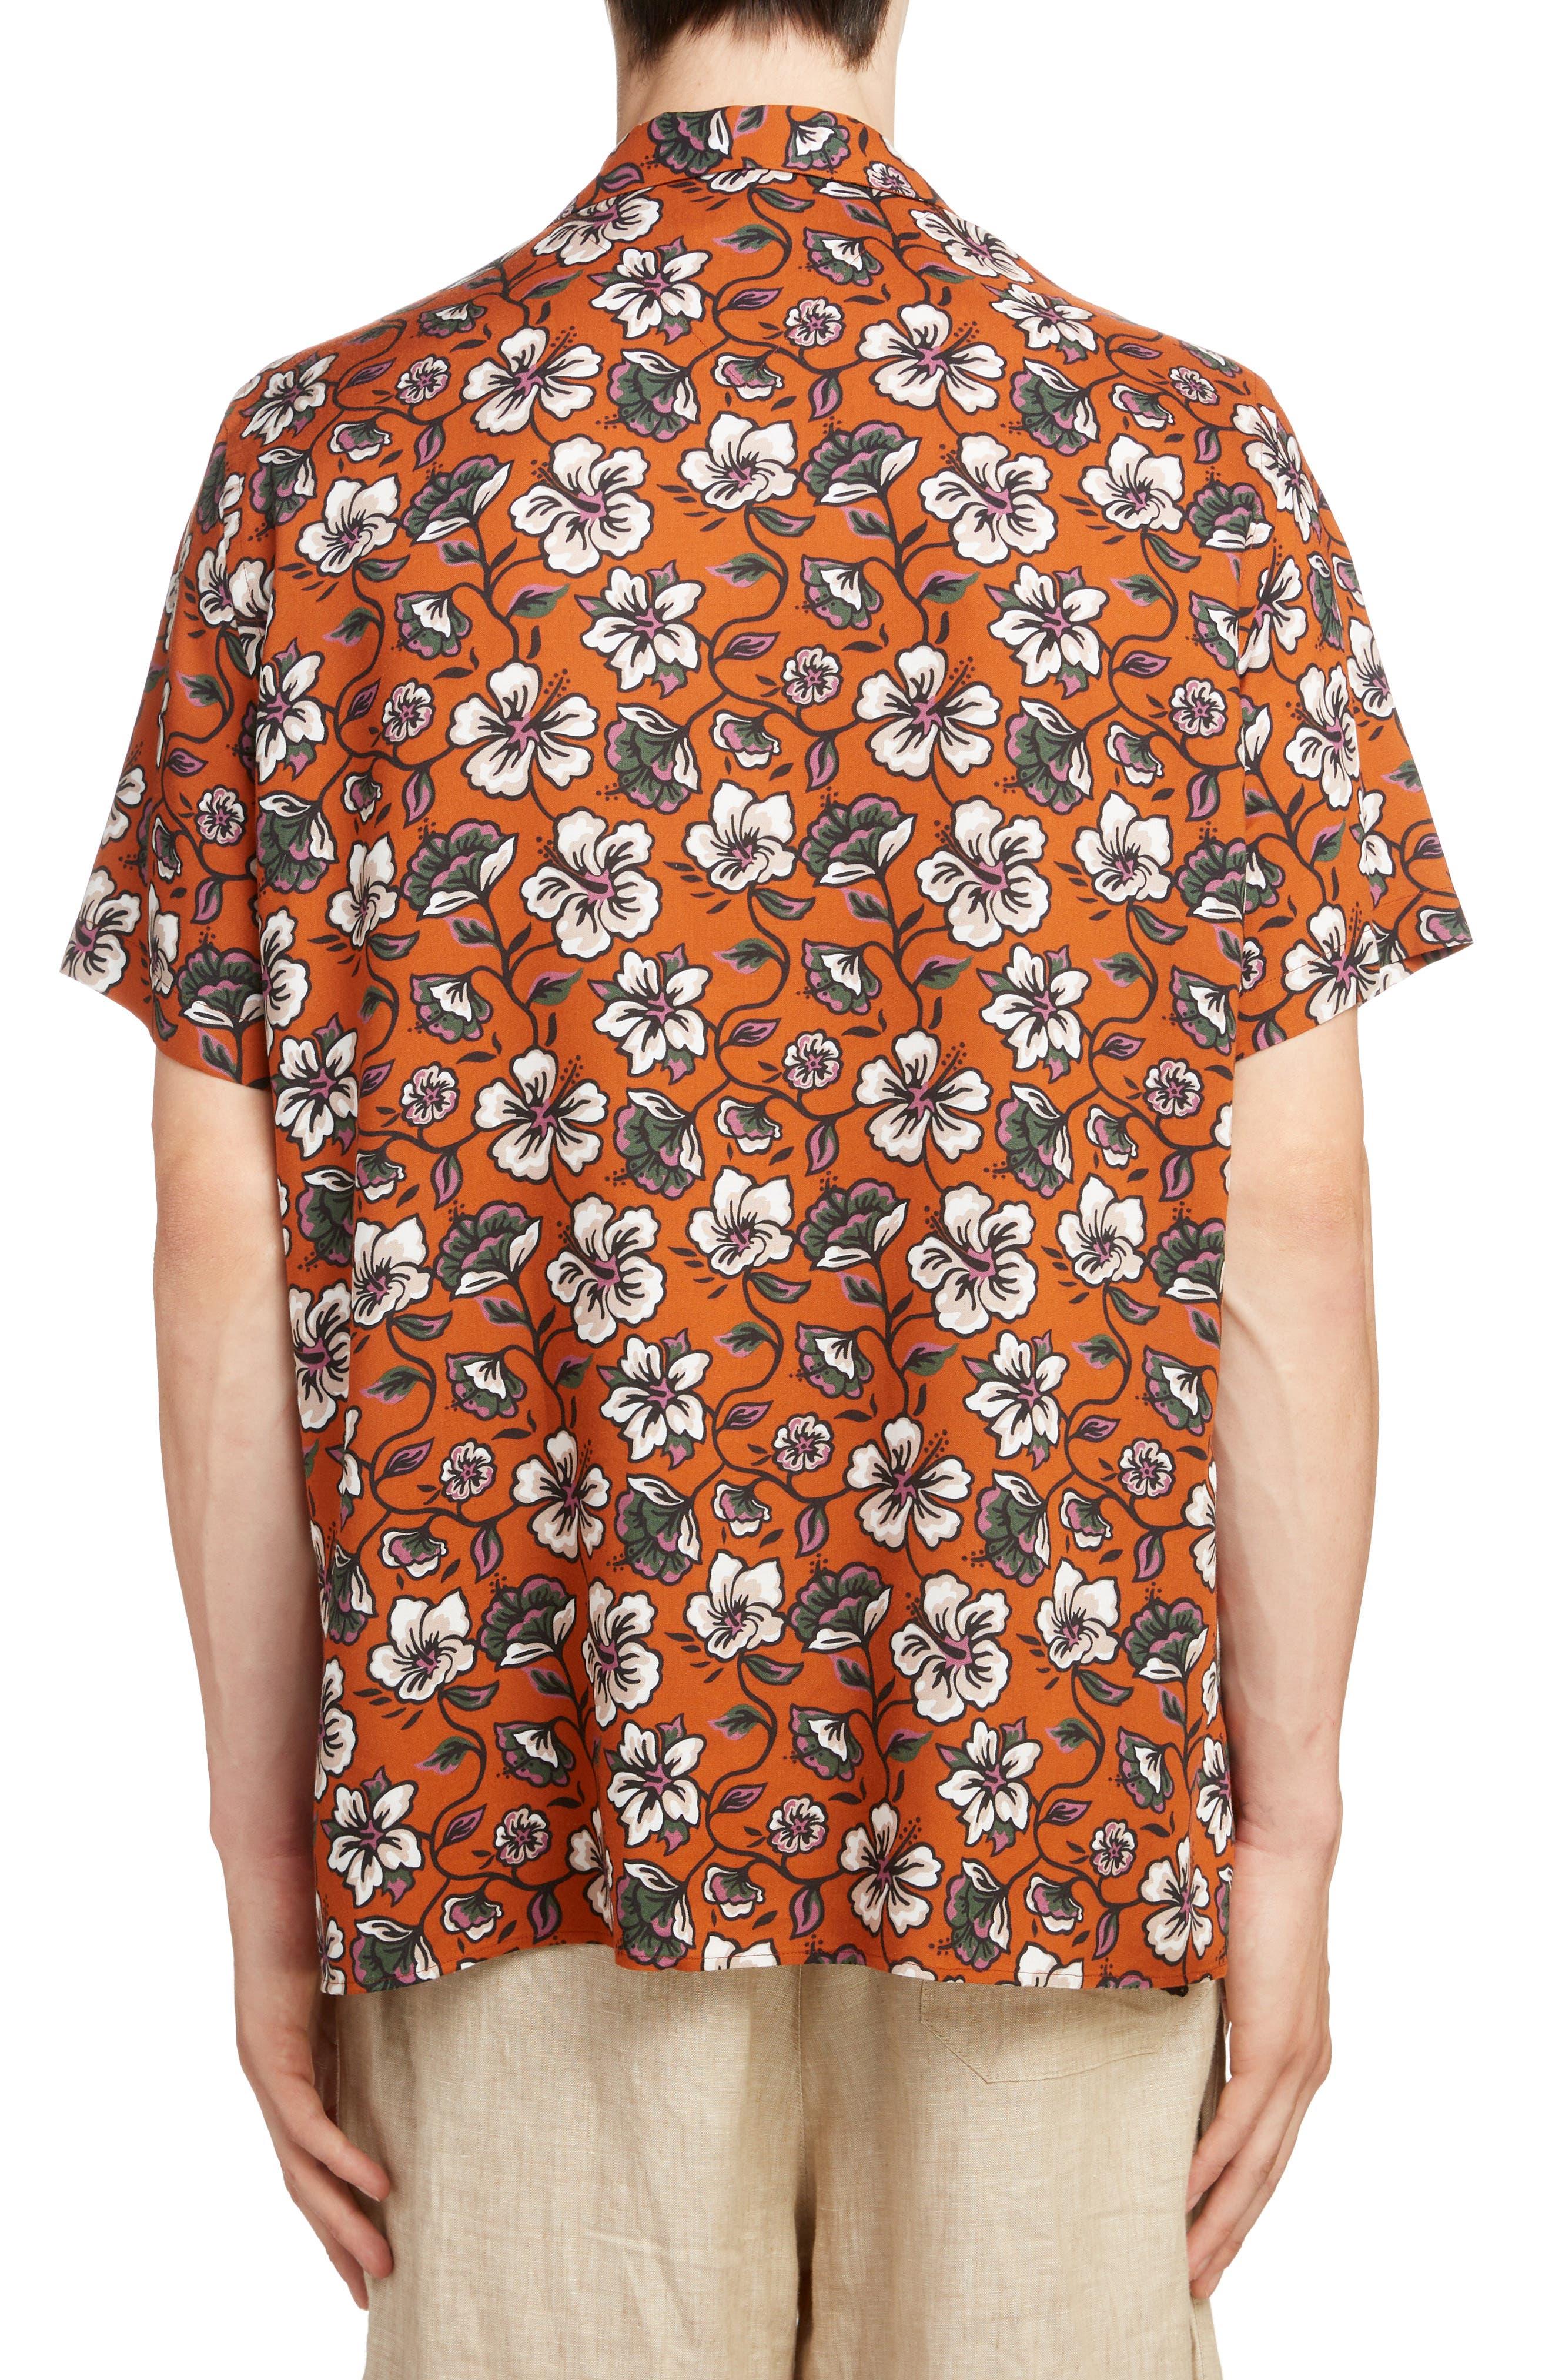 LOEWE,                             Floral Print Camp Shirt,                             Alternate thumbnail 3, color,                             2103-WHITE/ BROWN